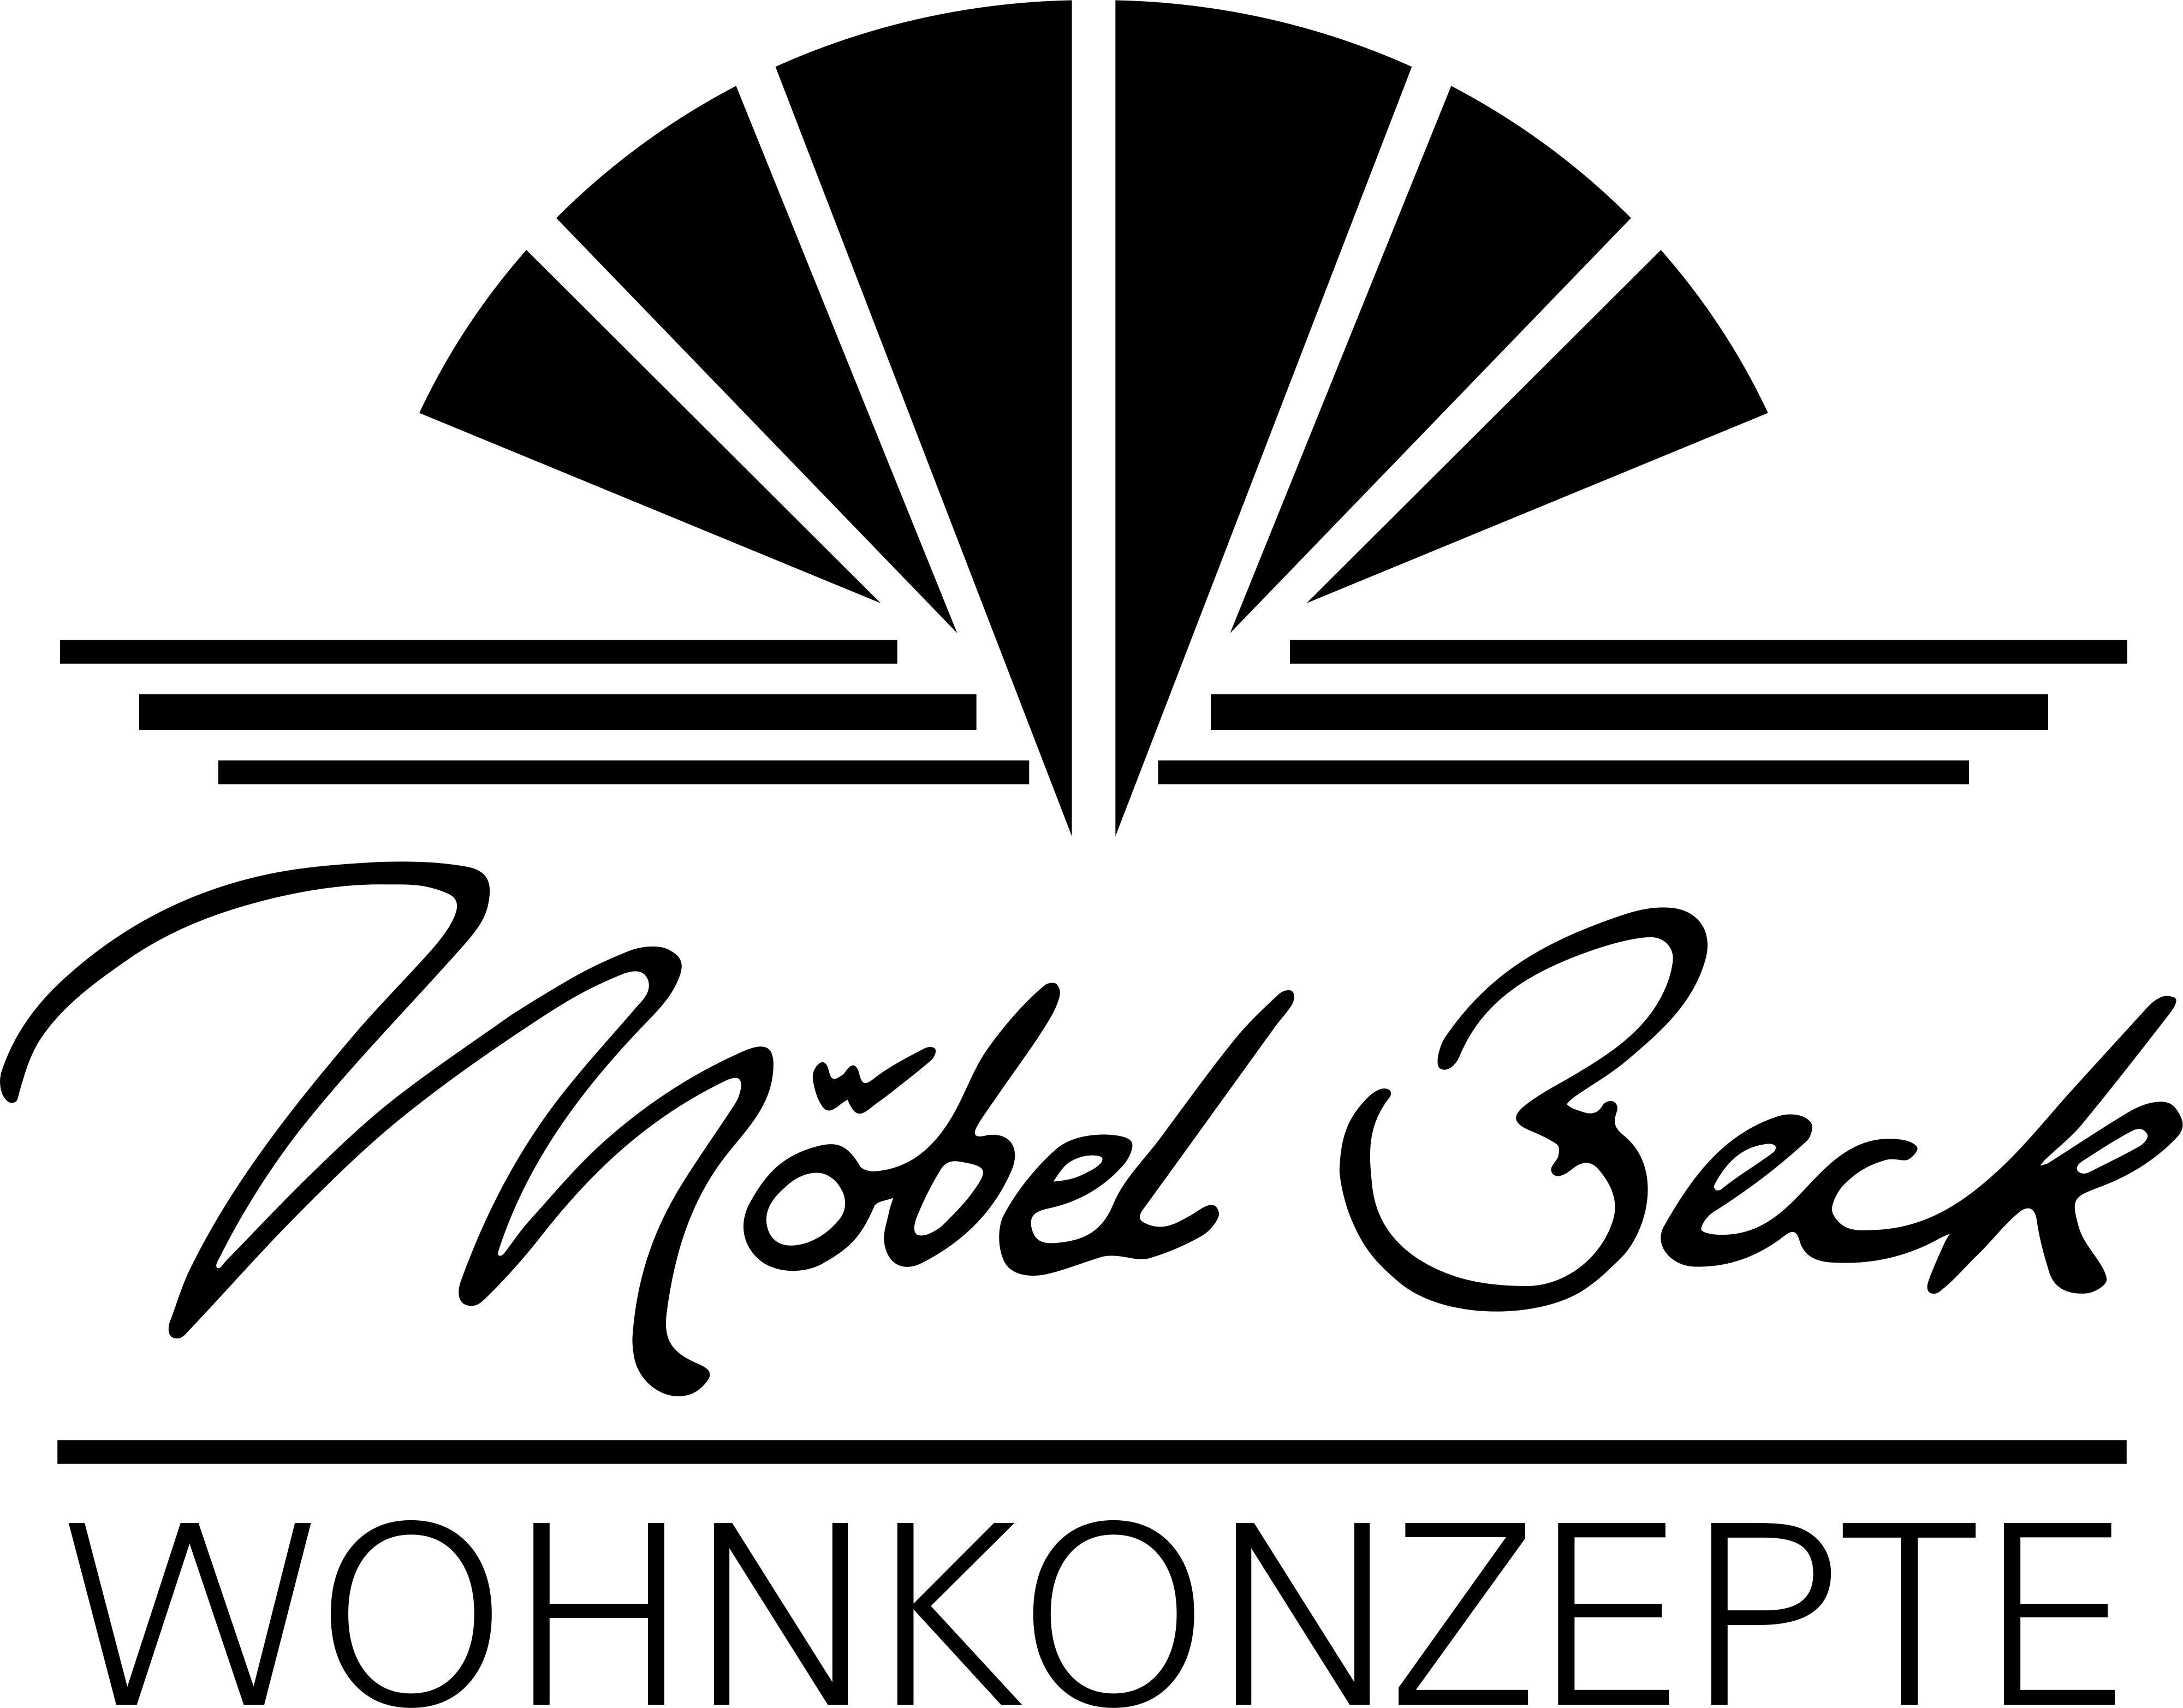 moebel-beck-wohnkonzepte-bad-saeckingen logo